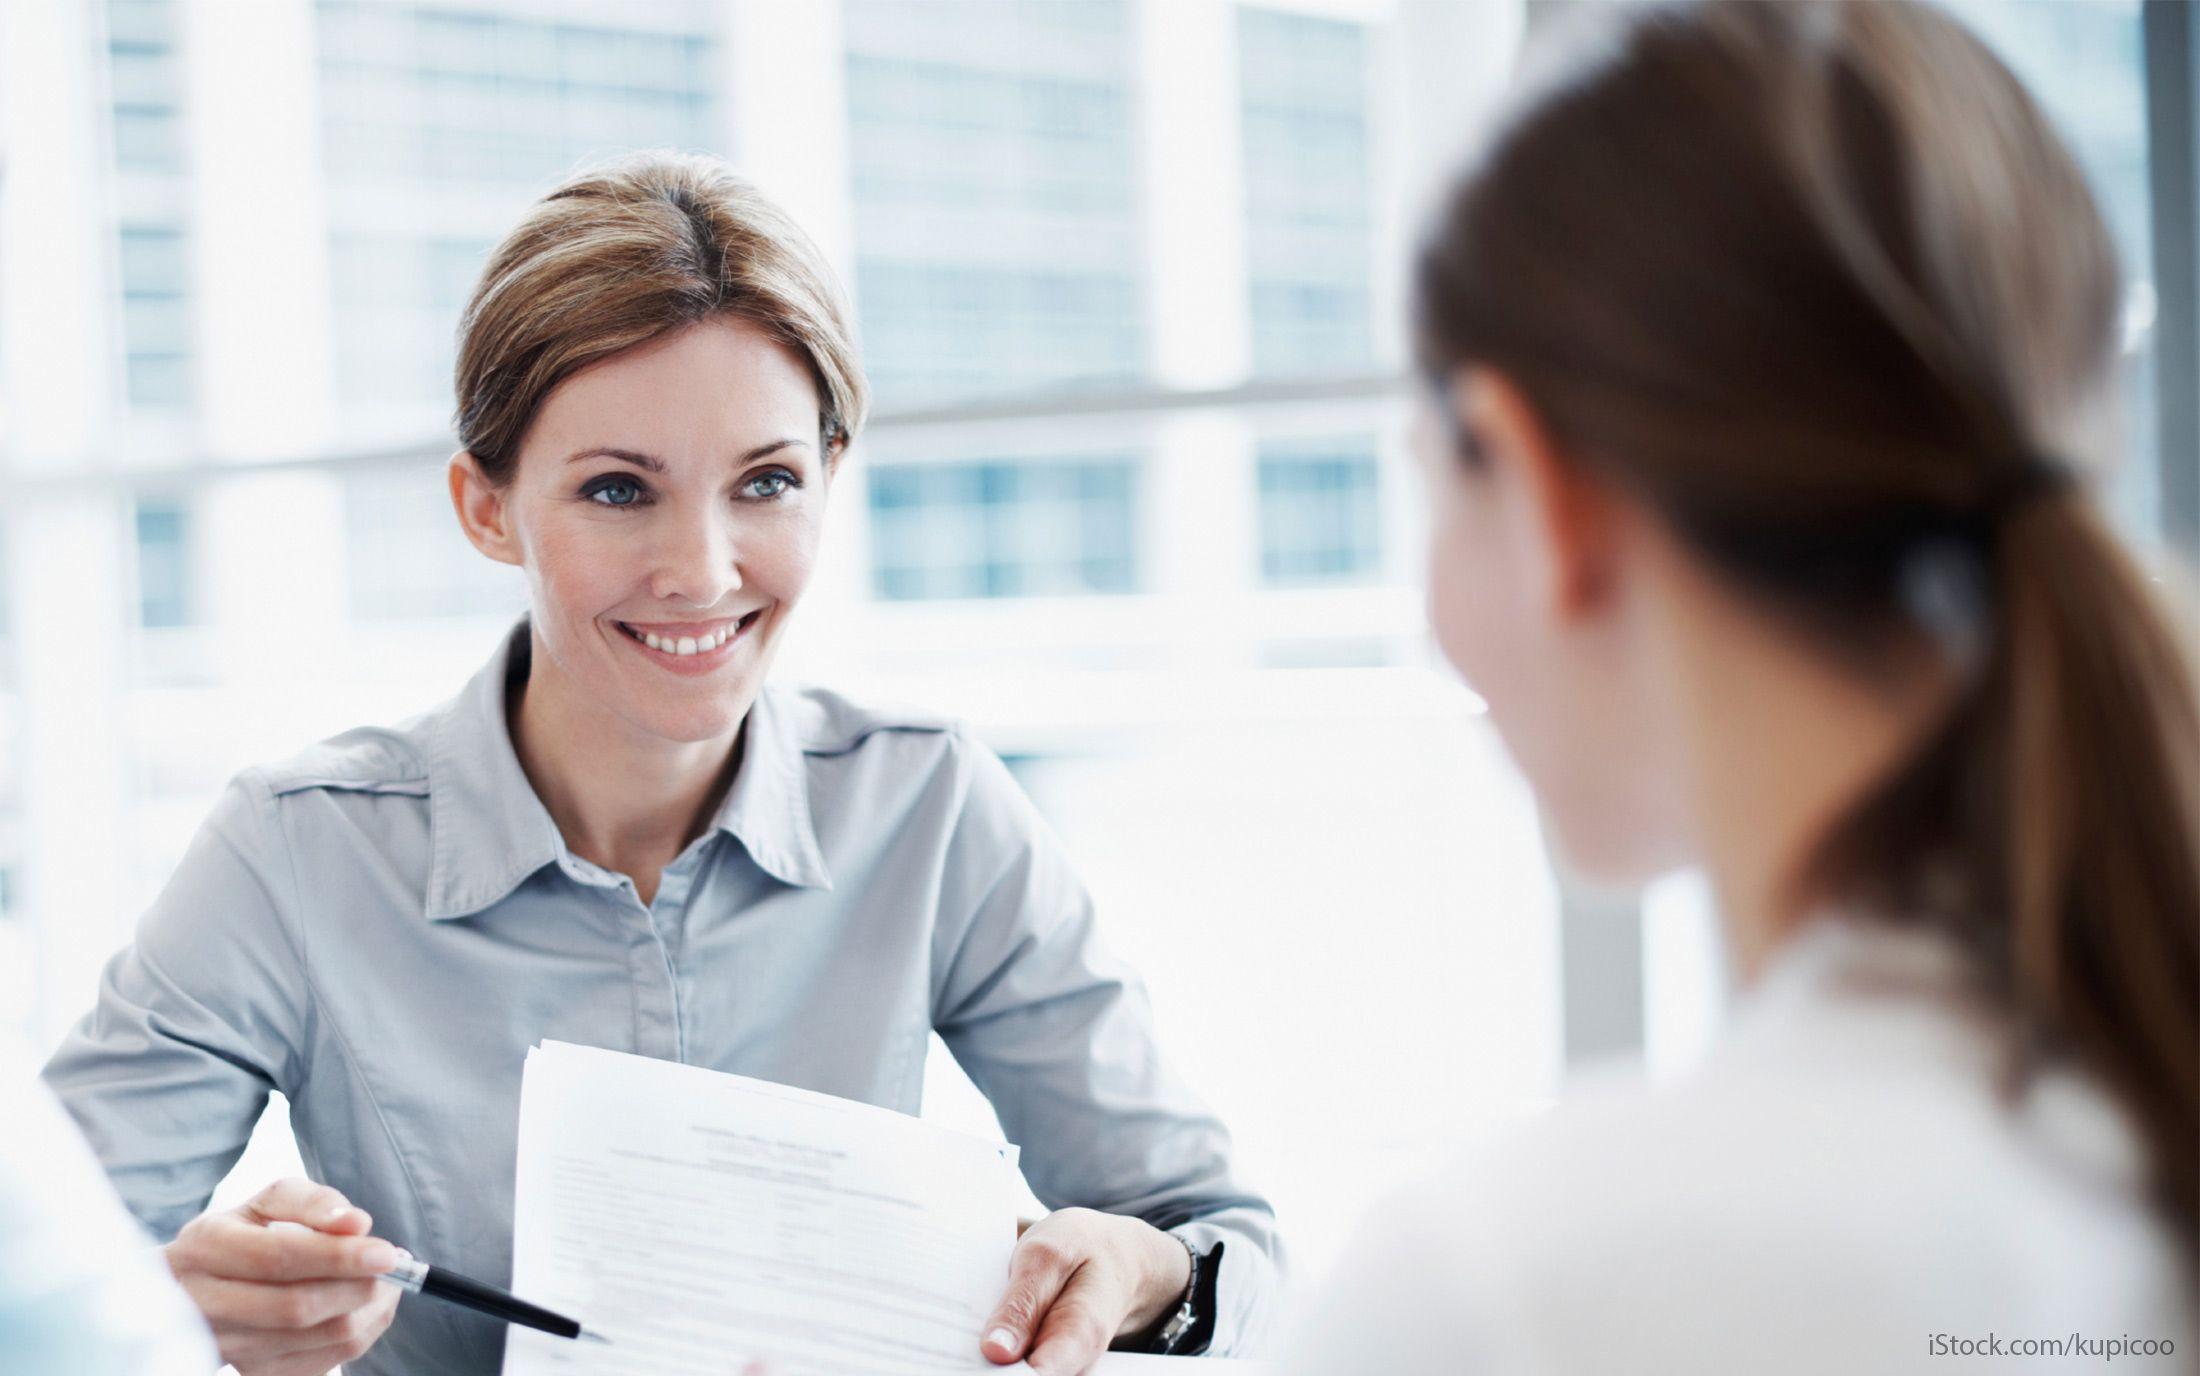 professional investing advice